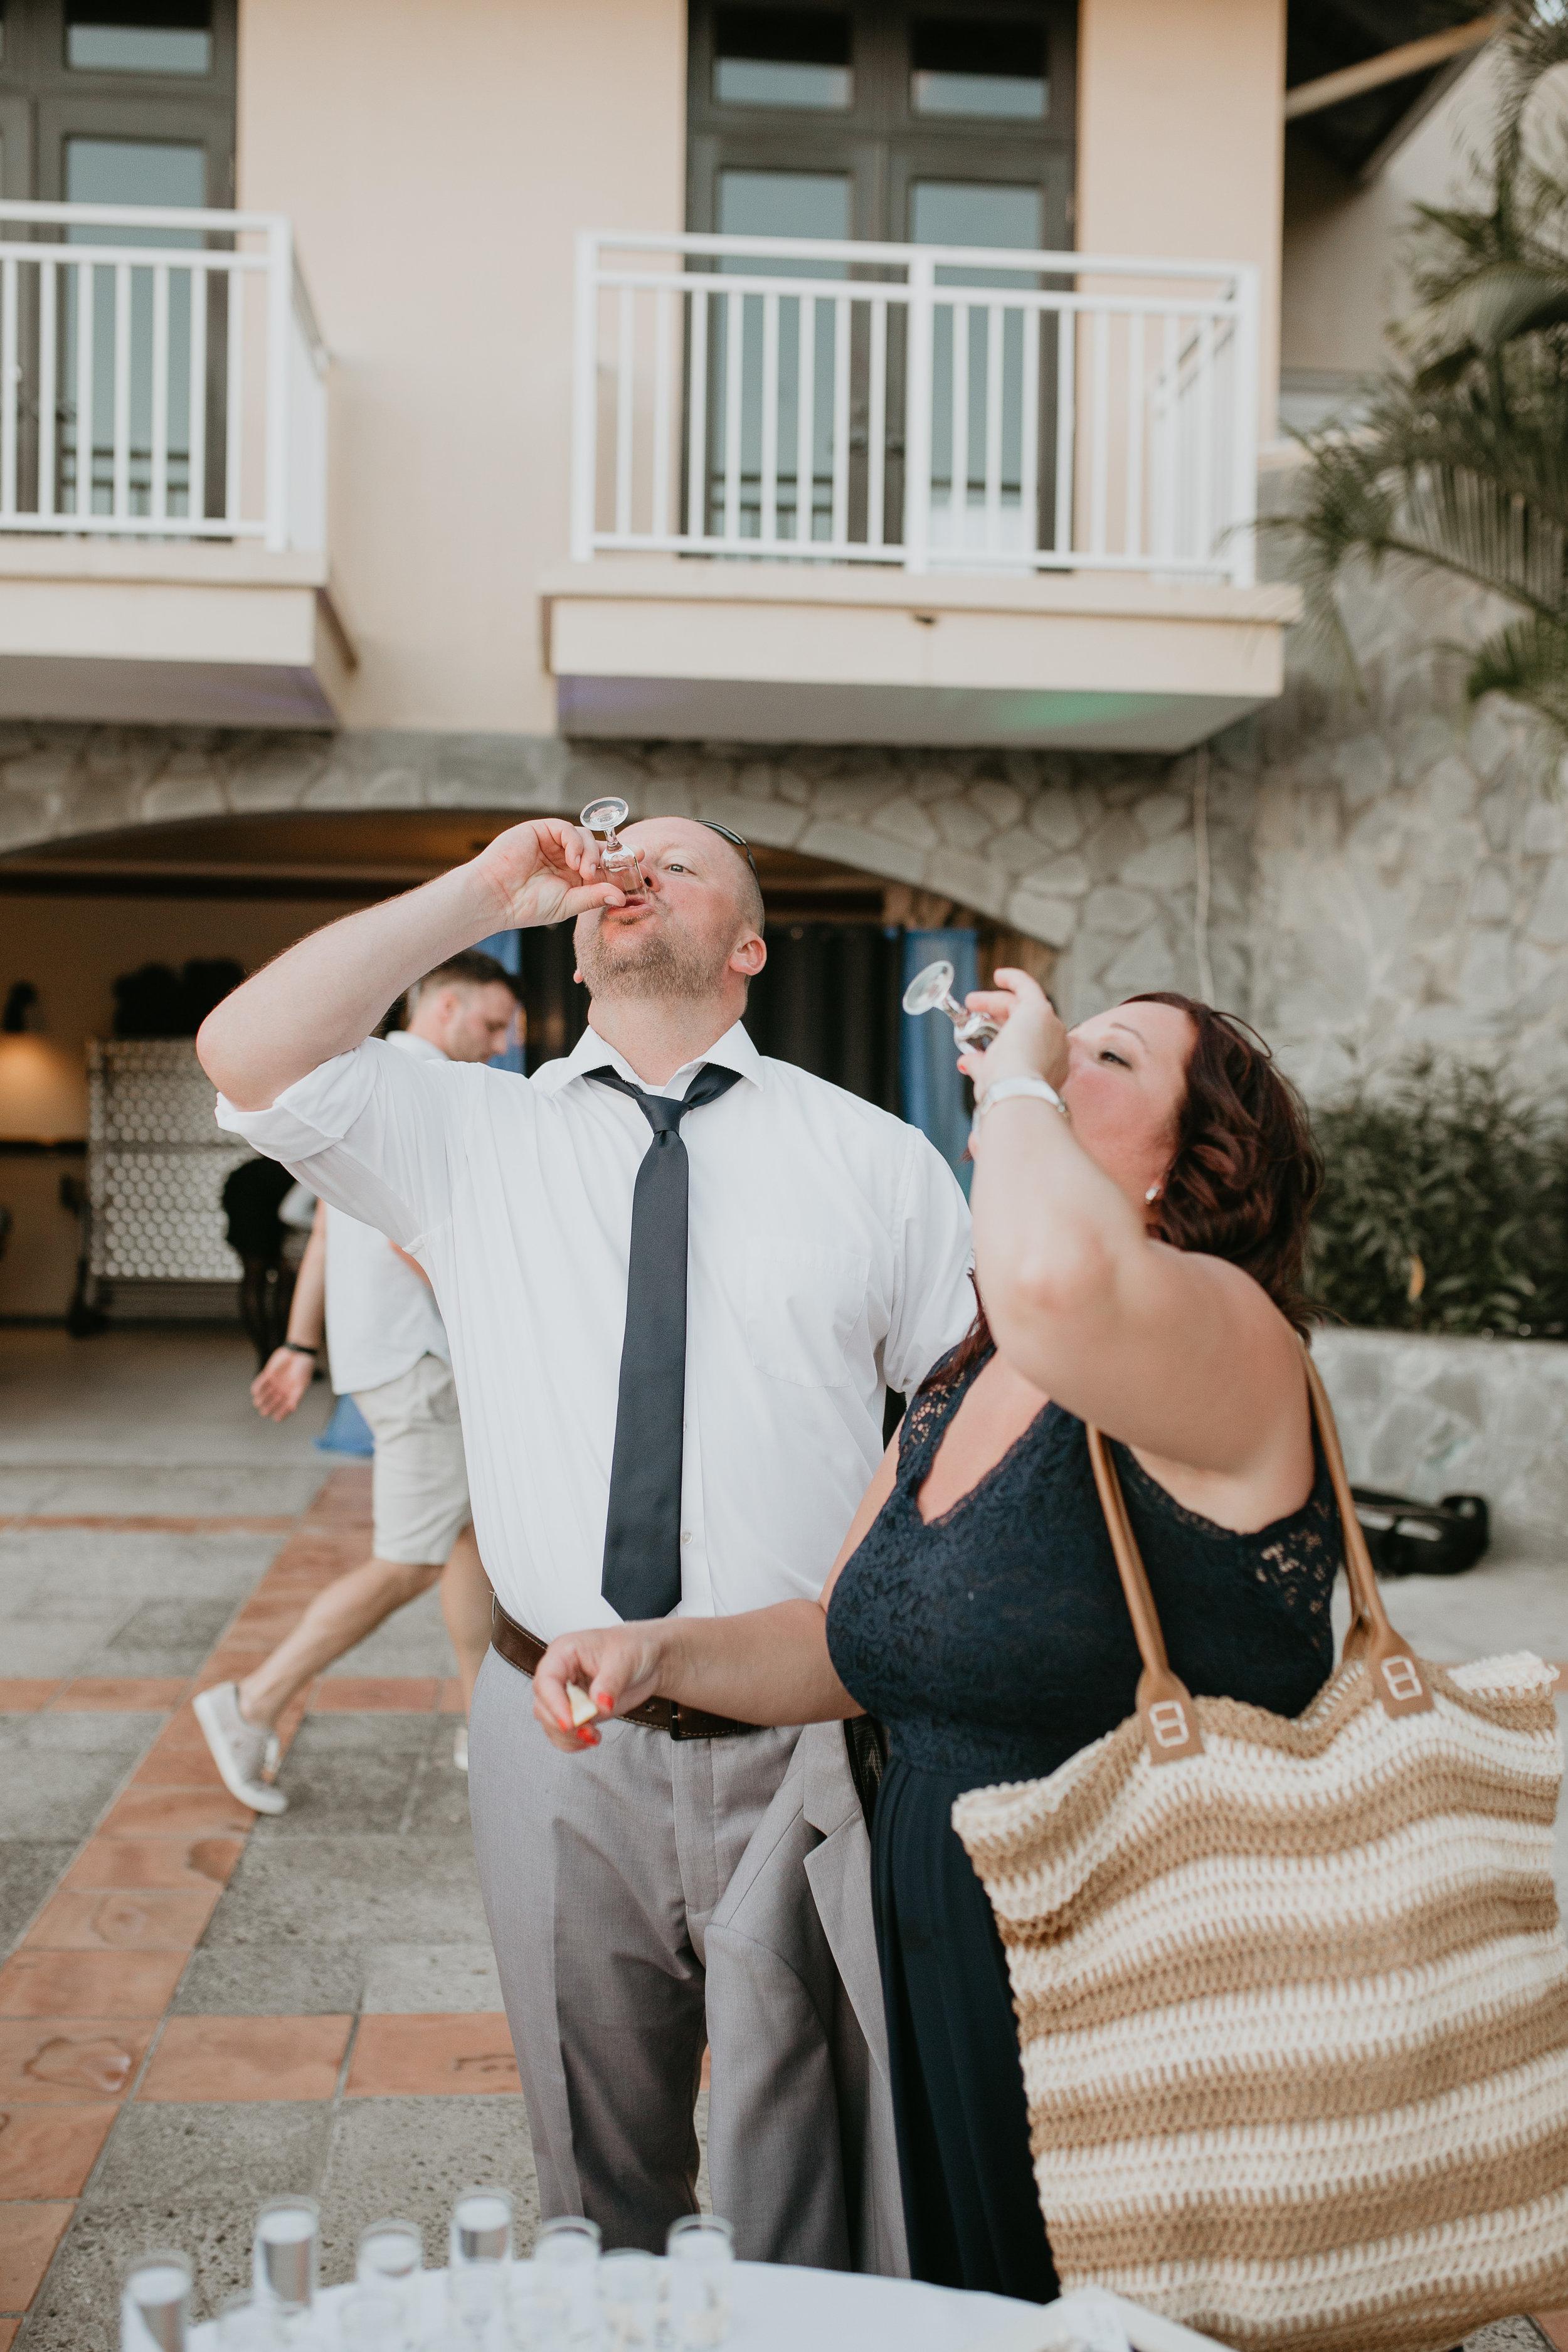 nicole-daacke-photography-destination-wedding-in-st-lucia-sandals-la-toc-intimate-island-wedding-carribean-elopement-photographer-chill-island-wedding-120.jpg